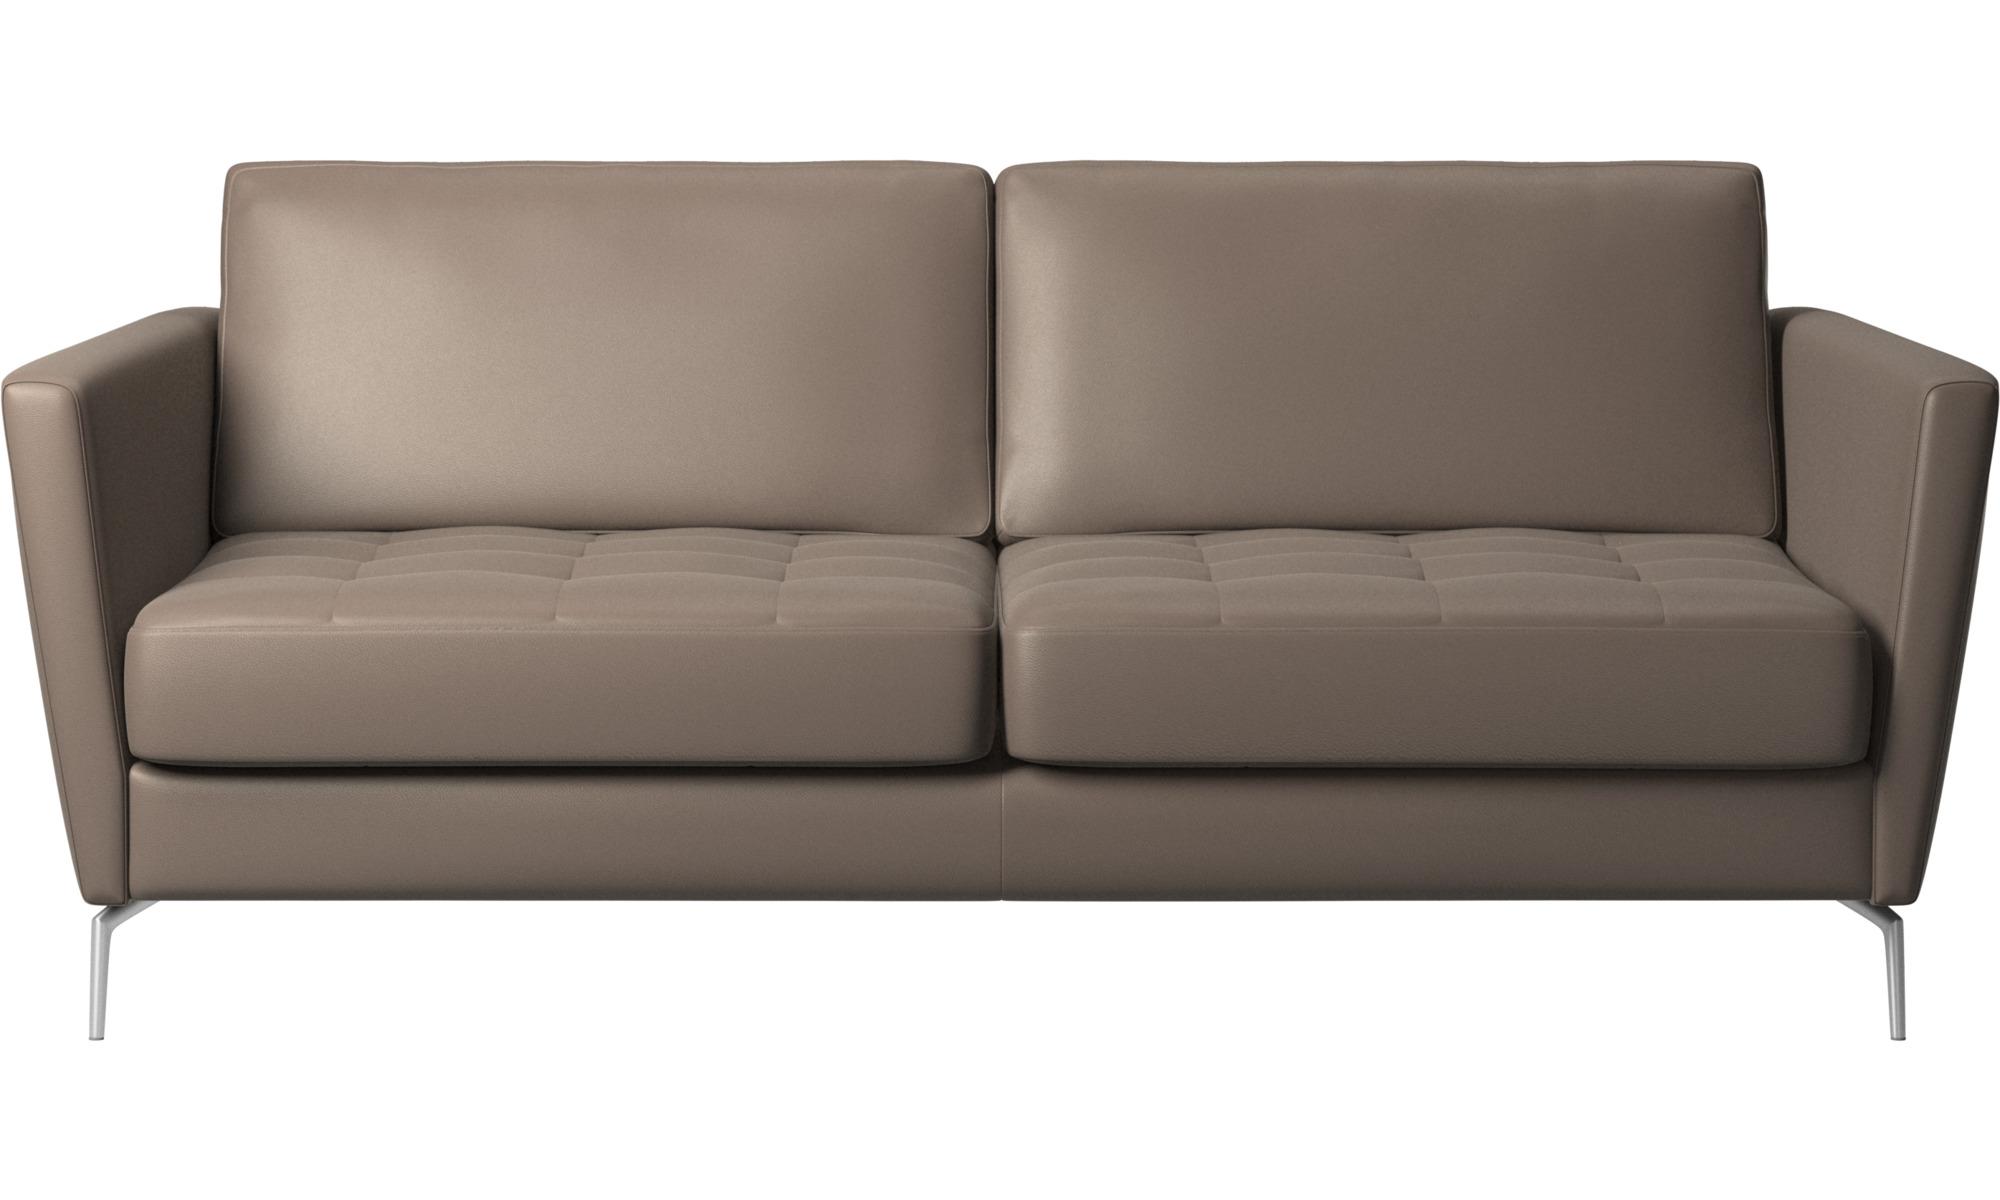 Grey Leather Sofas Boconcept